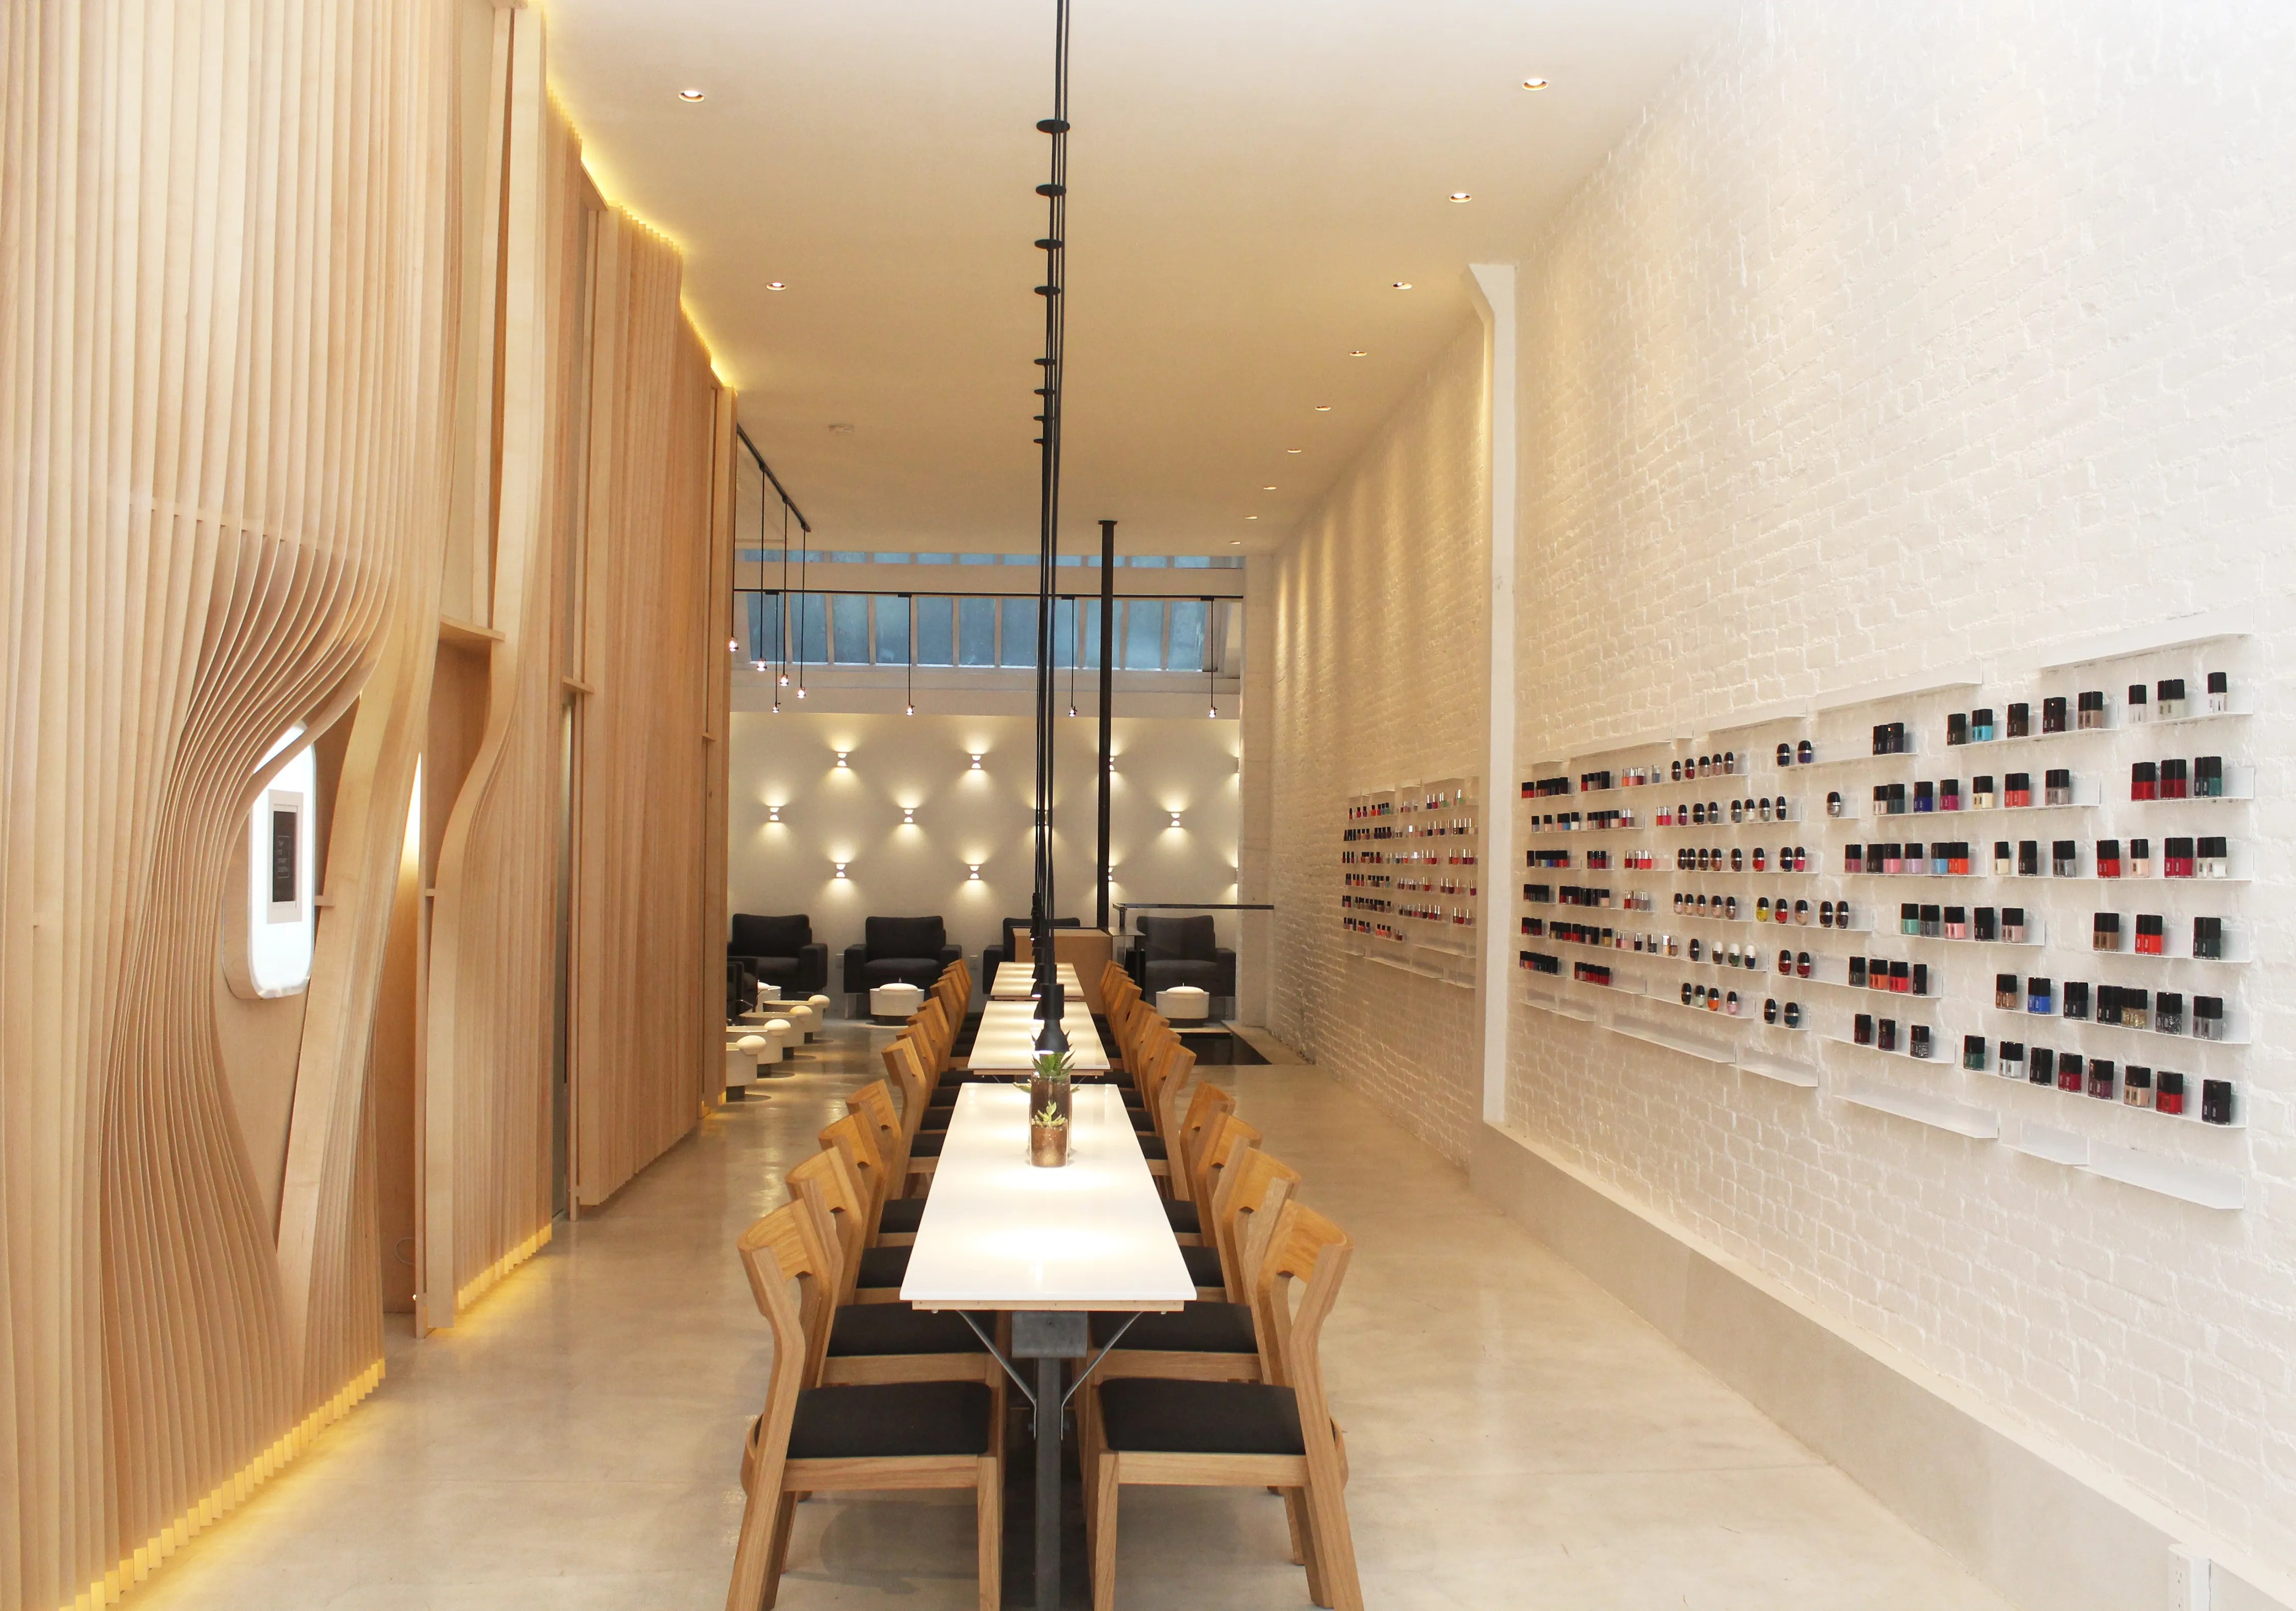 6 HighDesign Nail Salons from Coast to Coast Photos